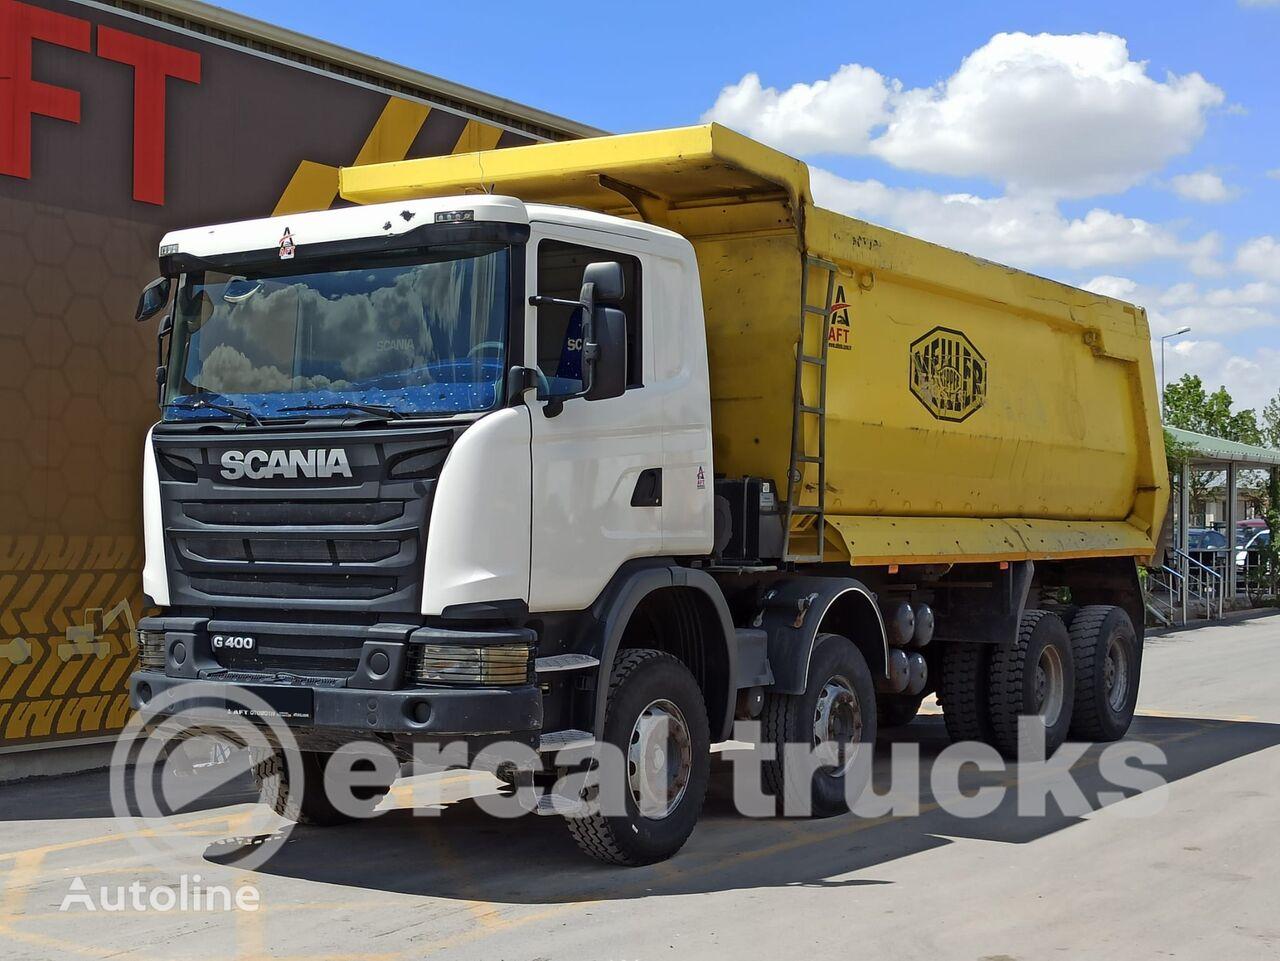 SCANIA 2014 G 400 E5 AC 8X4 HARDOX TIPPER dump truck